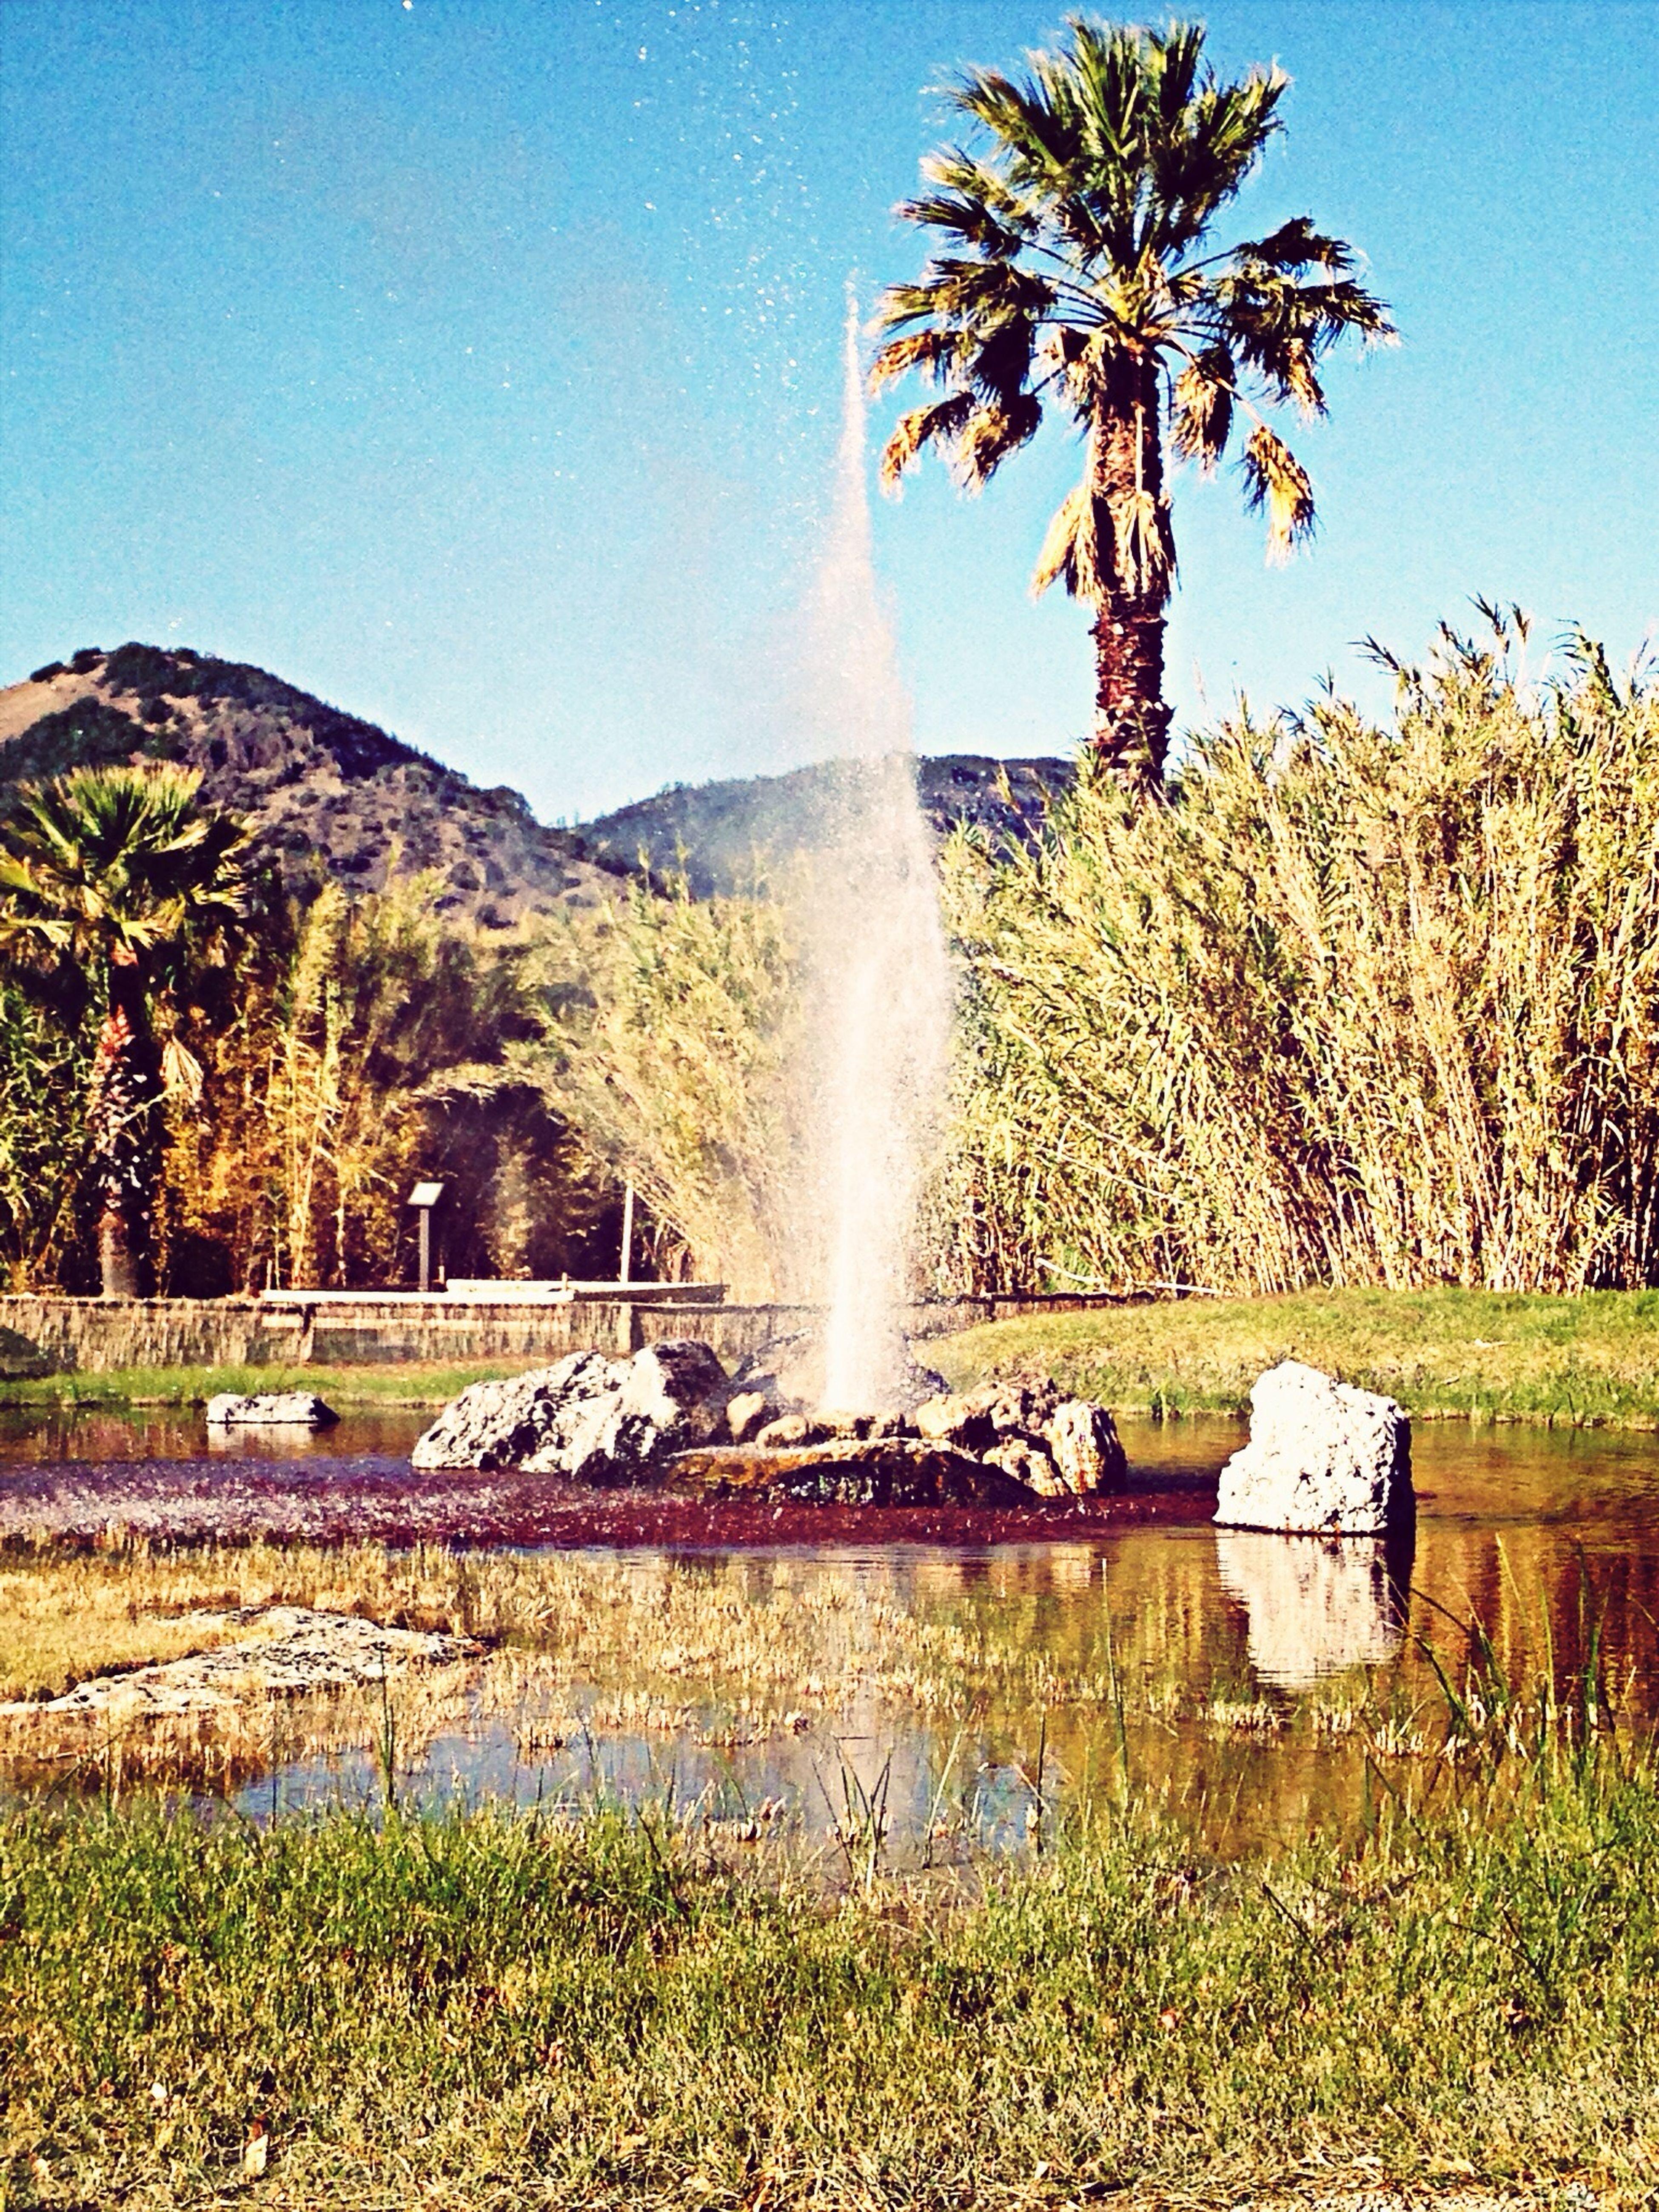 Geyser SpcEfx California Palm Trees Water California Beauty Rare Natural Occurances Natur Natural Beauty Mothernature Travel